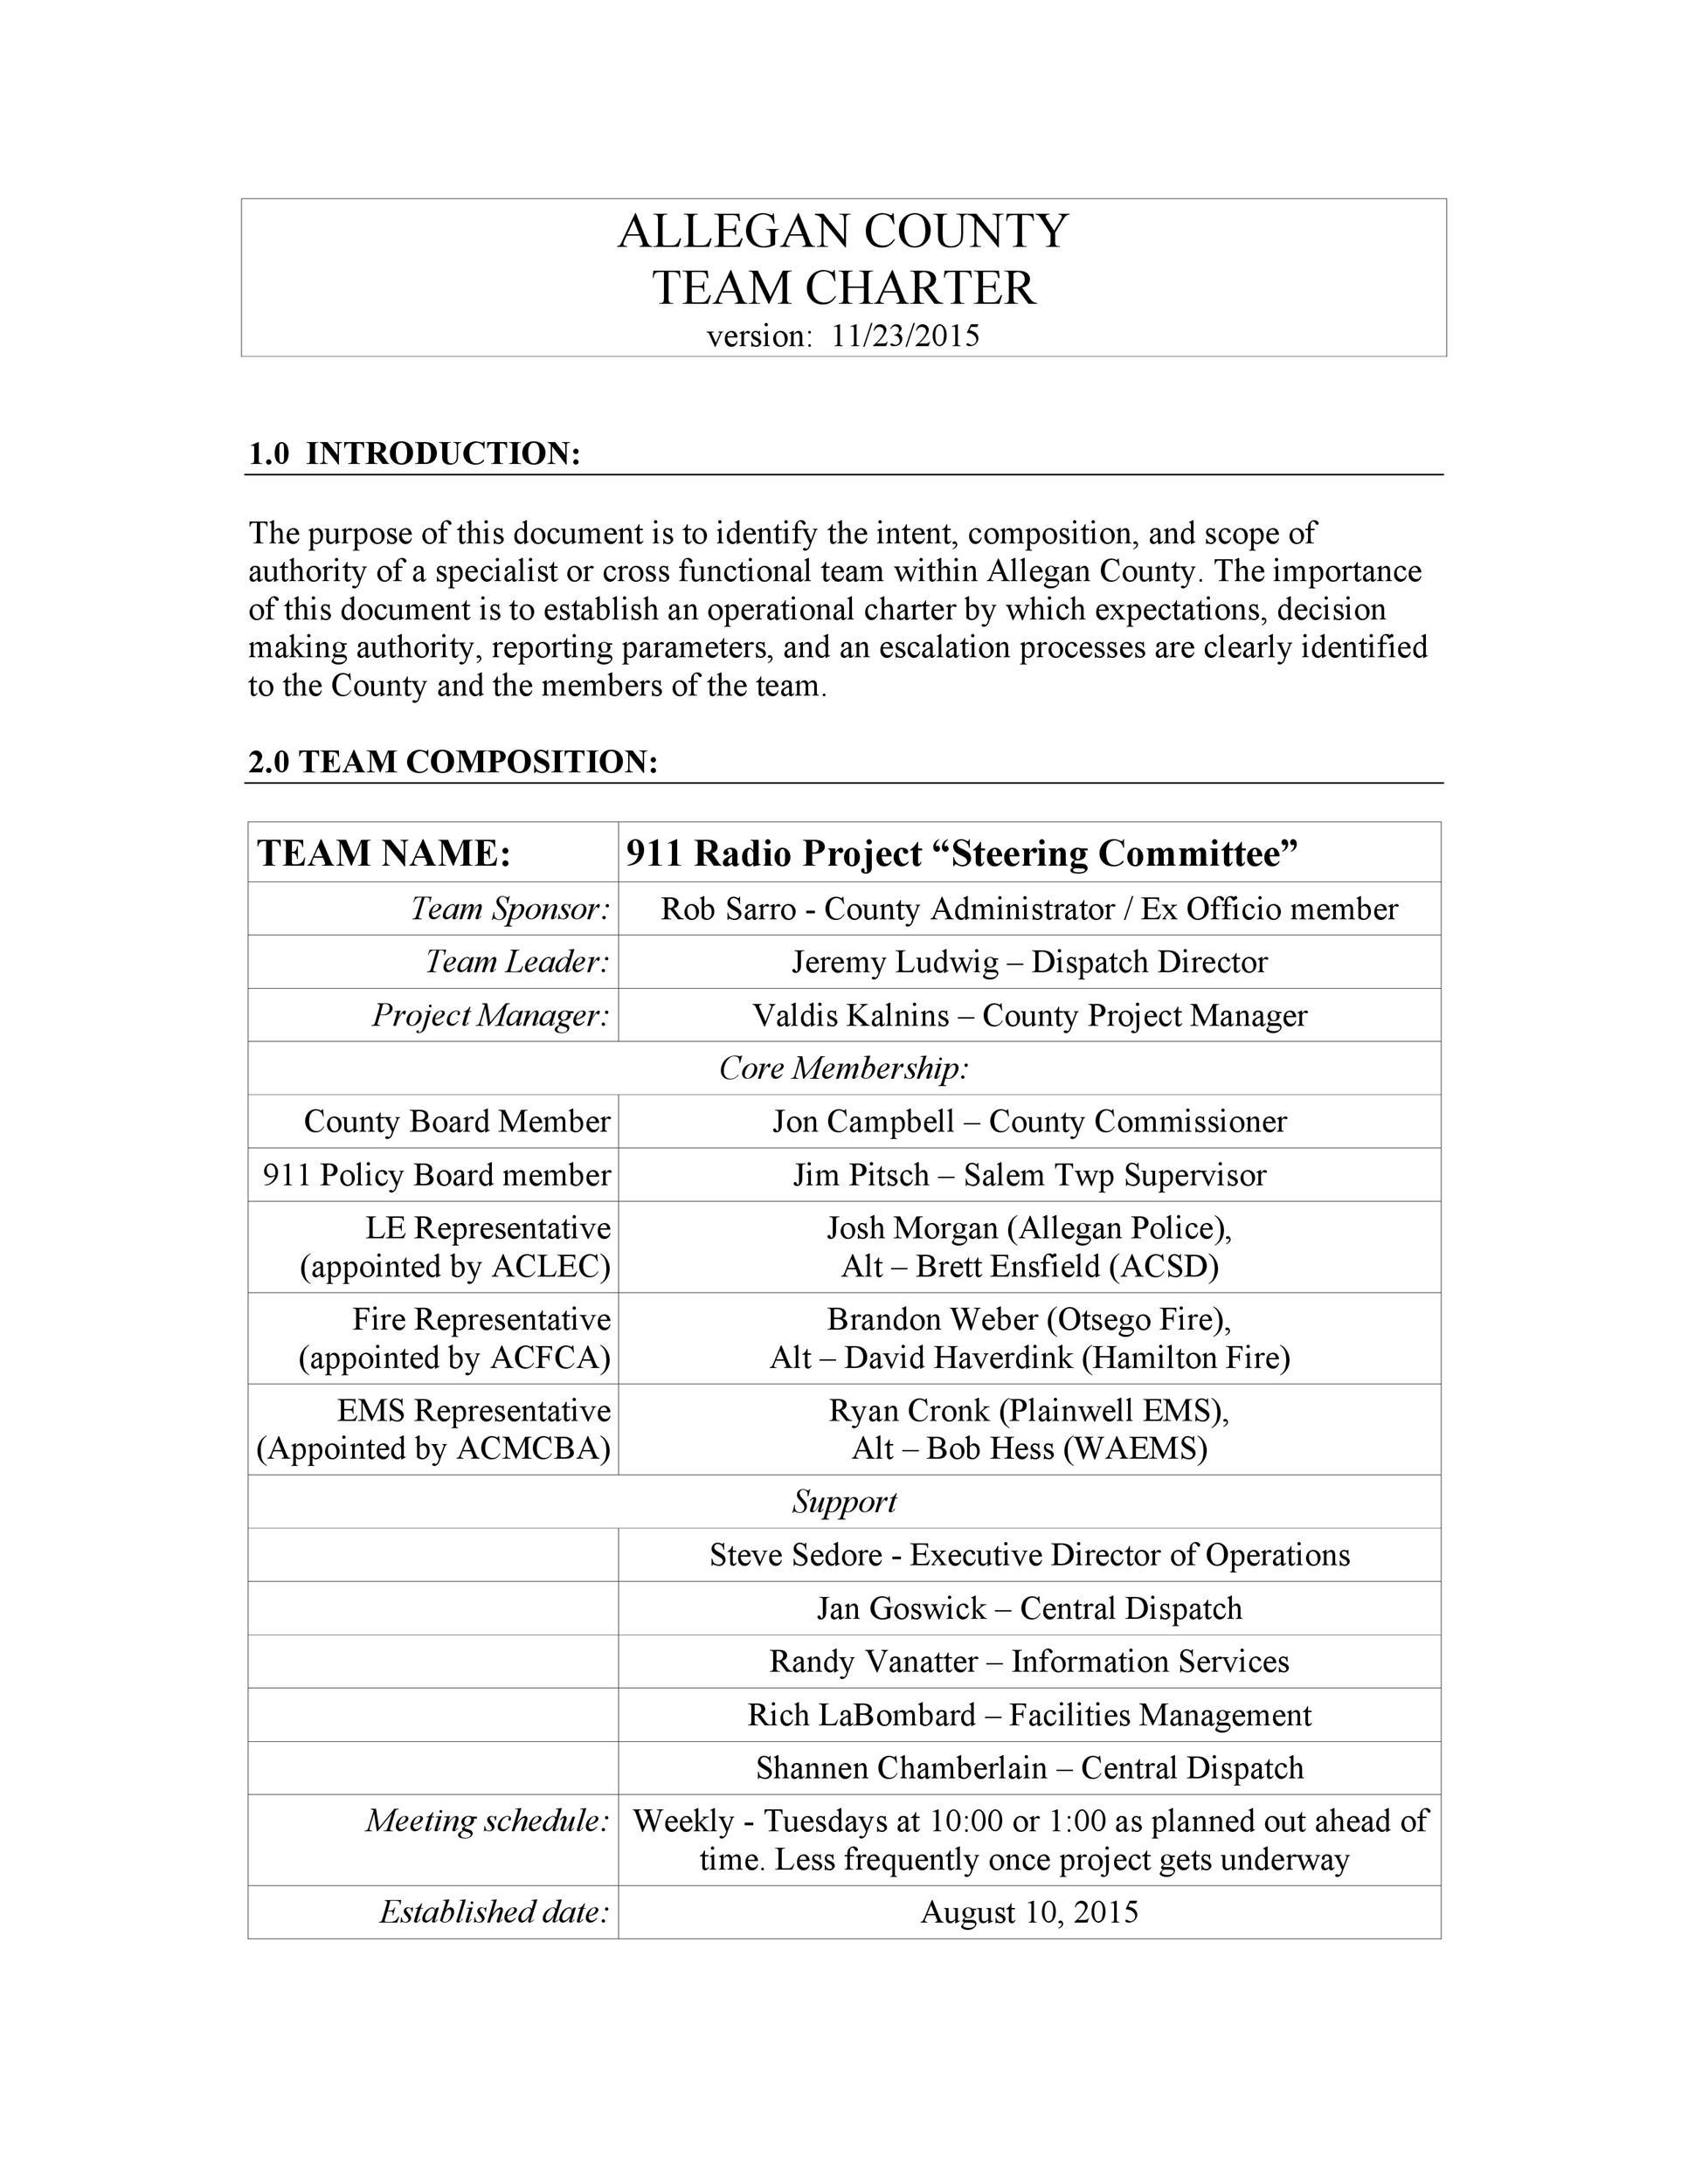 Free team charter template 48